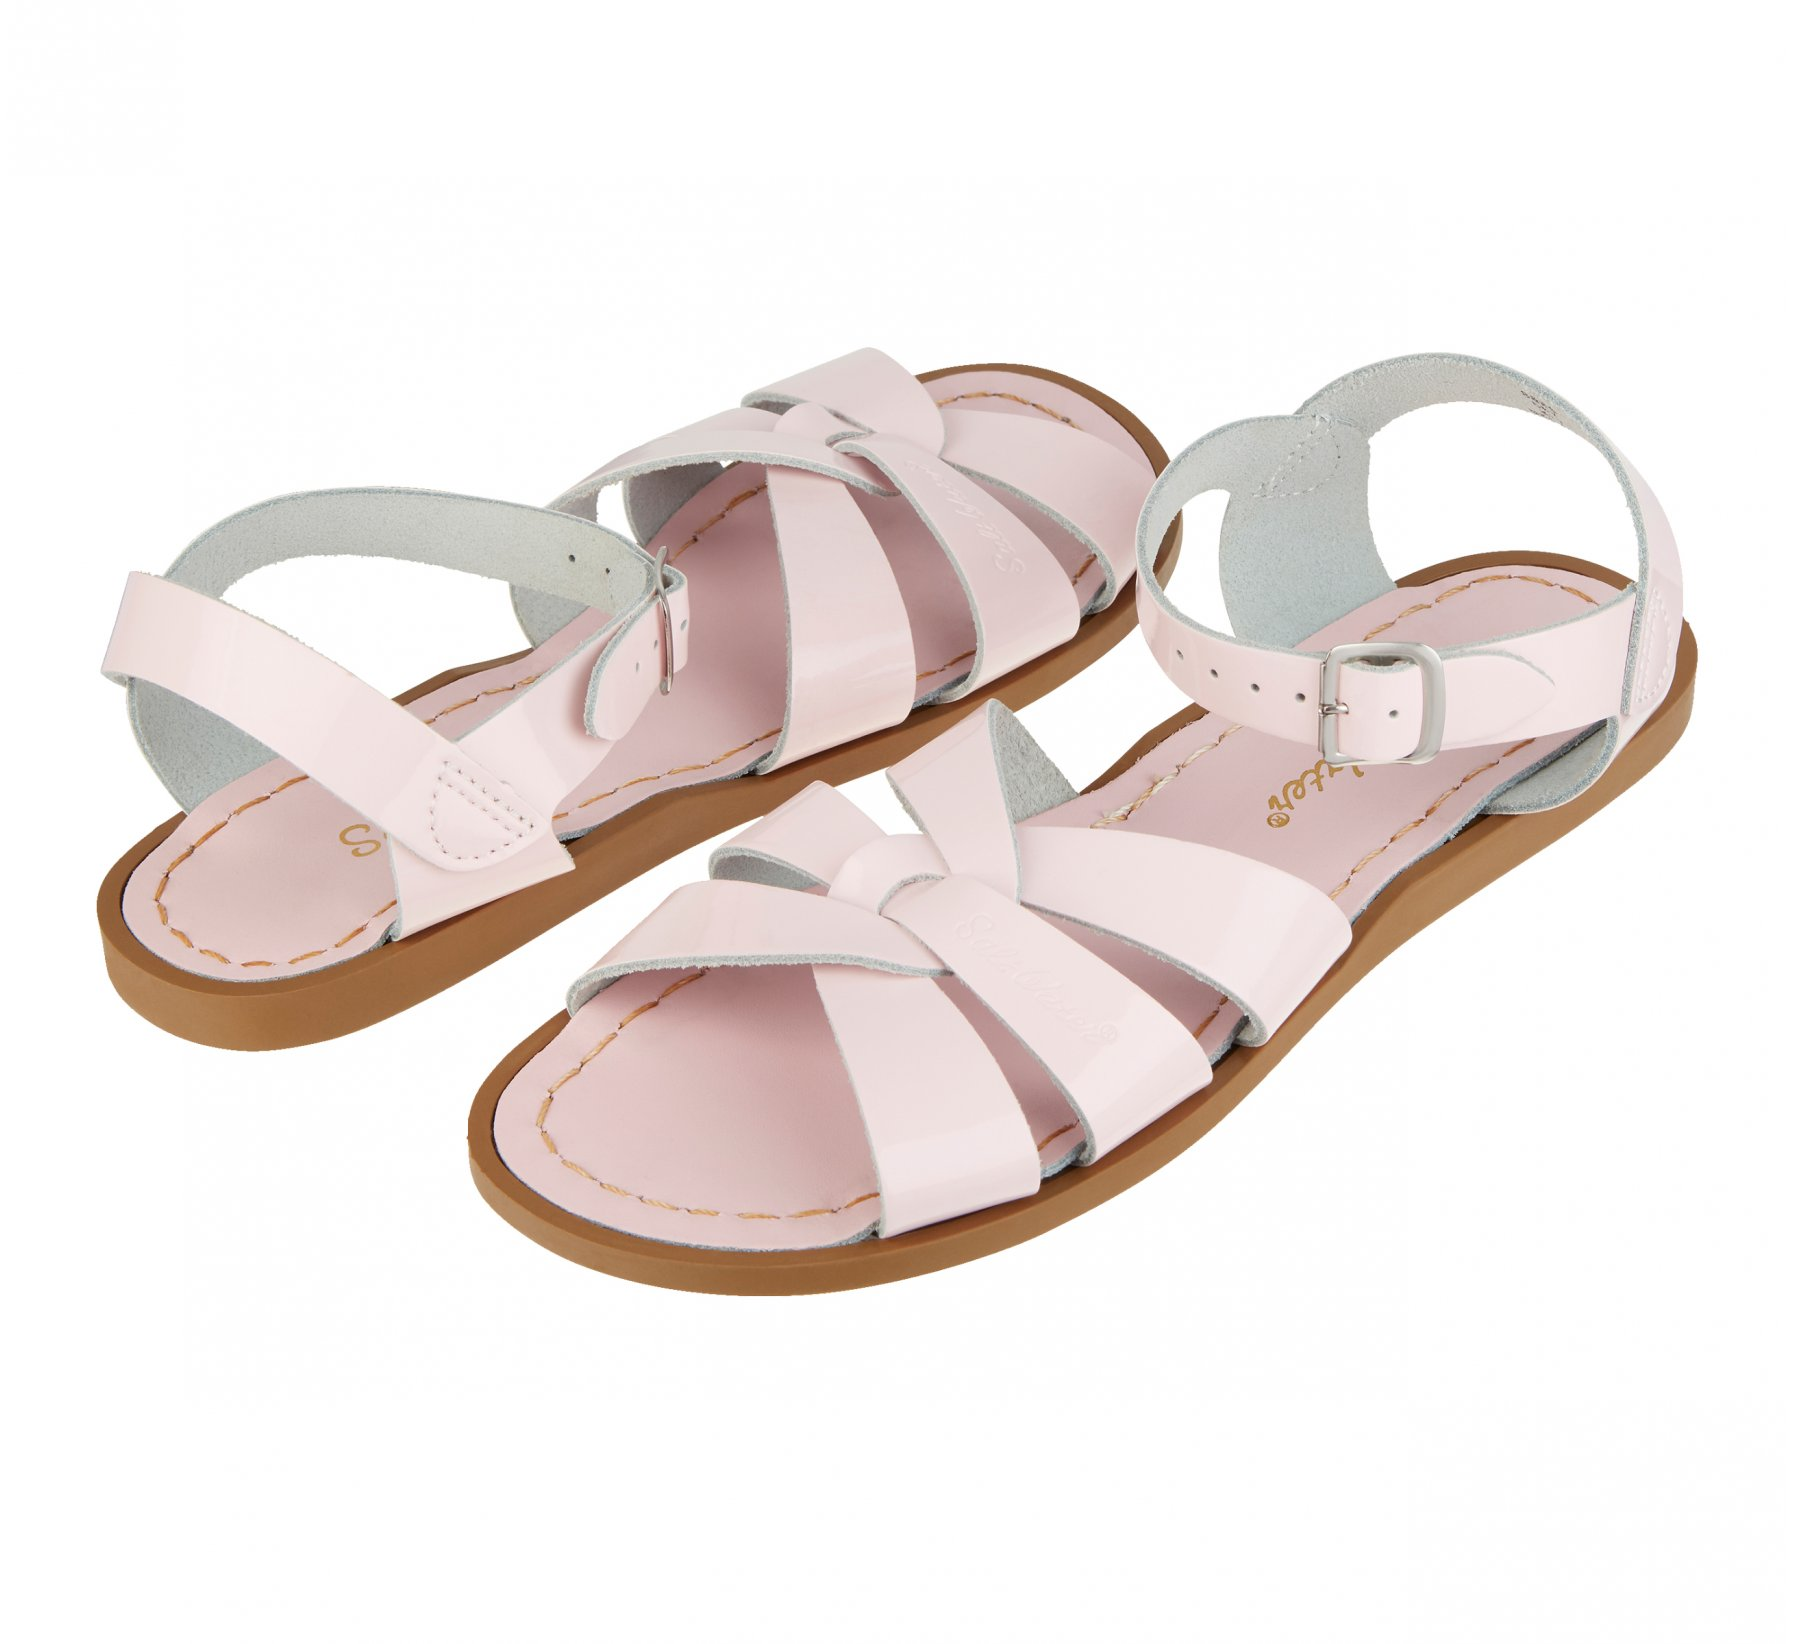 Original Shiny Pink - Salt Water Sandals